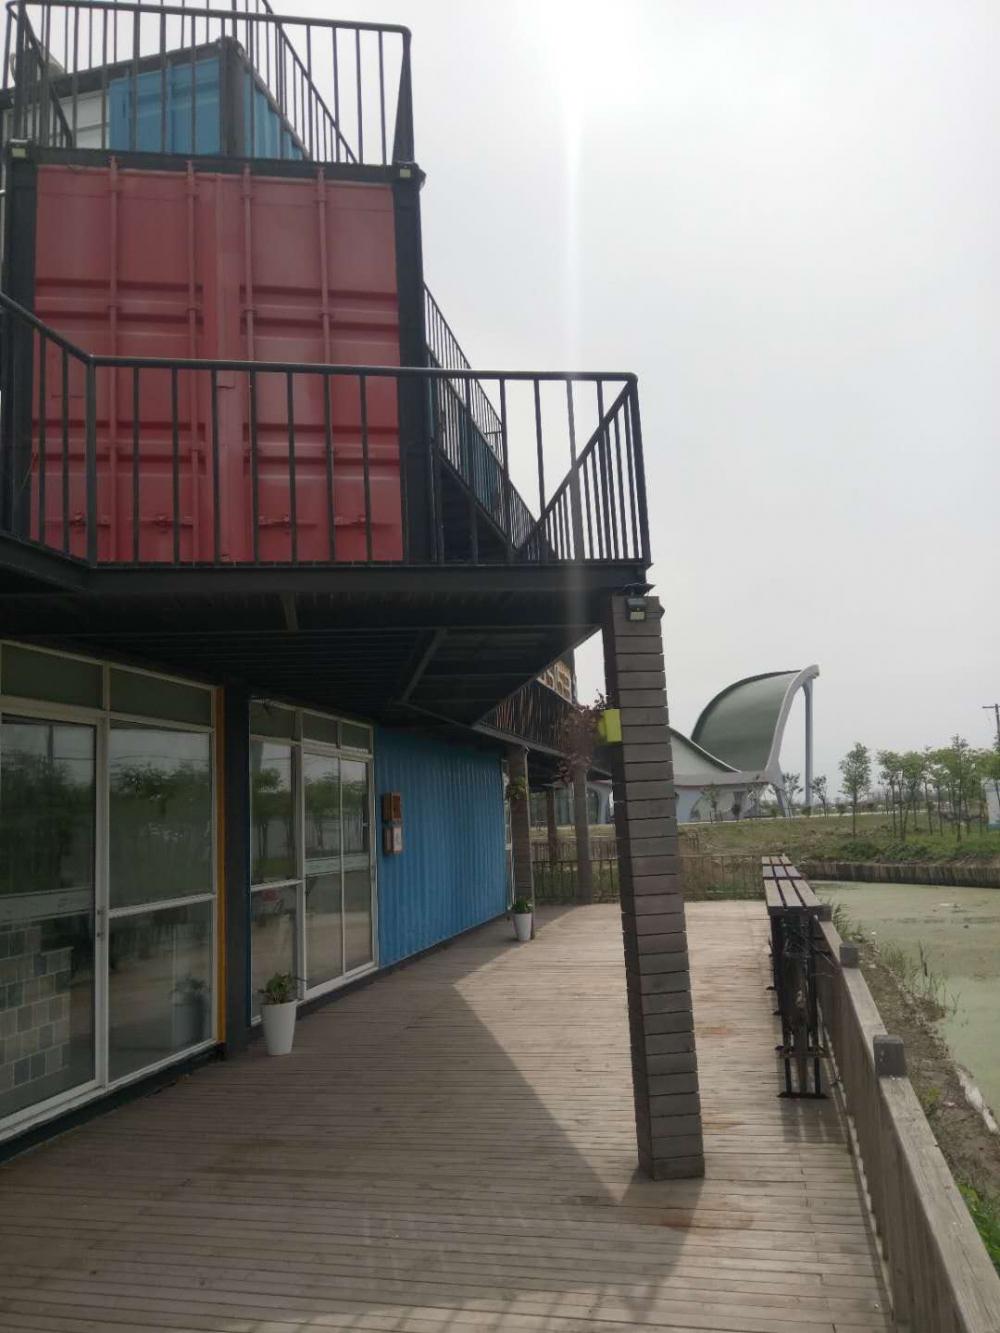 Павильон до реконструкции